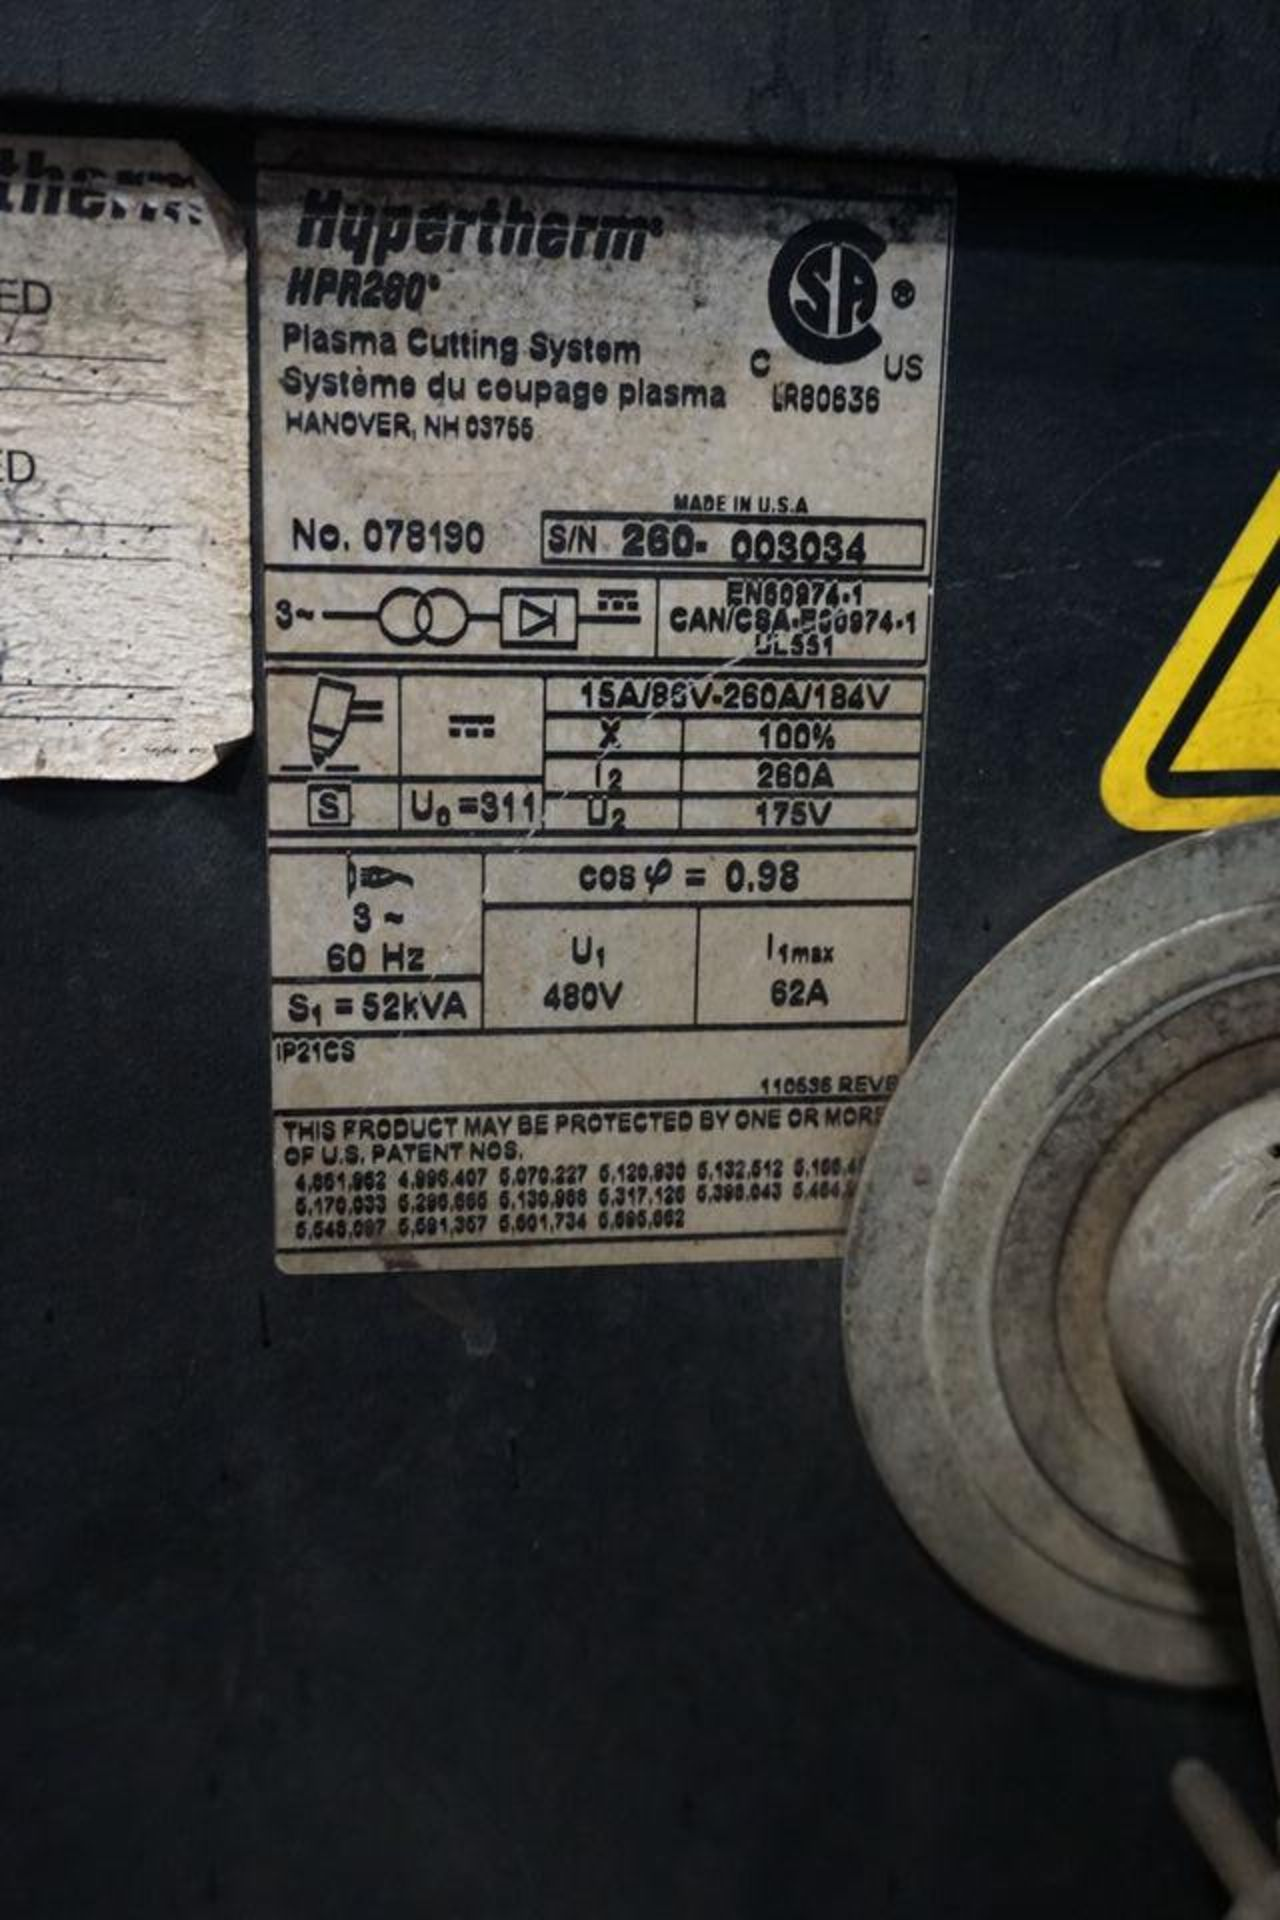 Lot 6 - (2008) RETRO SYSTEMS ULTRA HORNET 12' X 55' CNC PLASMA CUTTING SYSTEM W/ HYPERTHERM HPR280